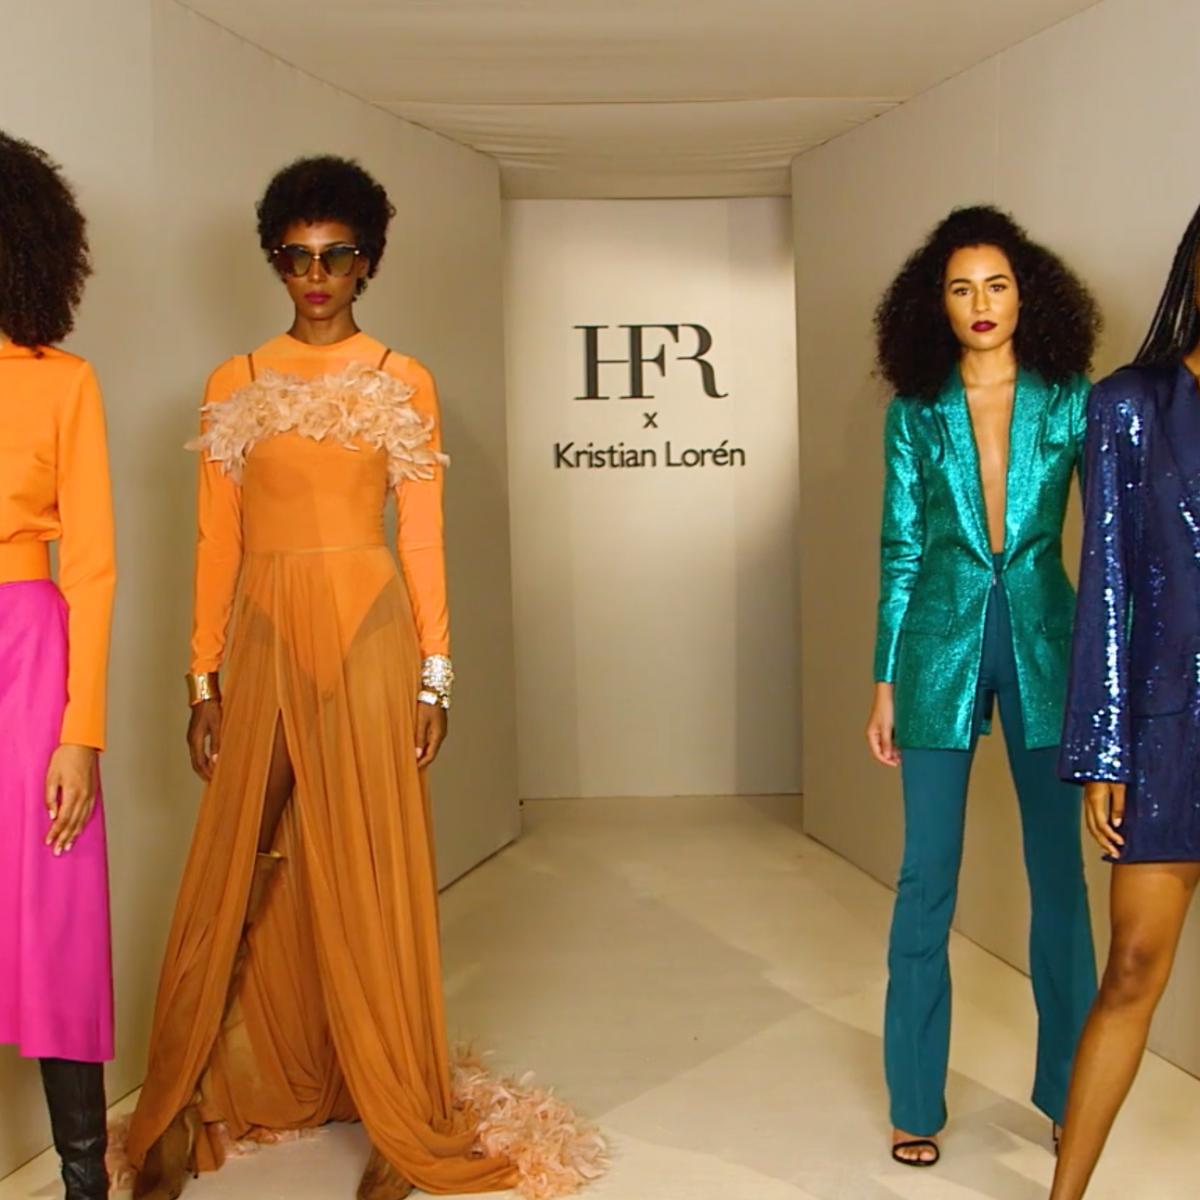 Harlem's Fashion Row Kicked Off NYFW This Past Sunday